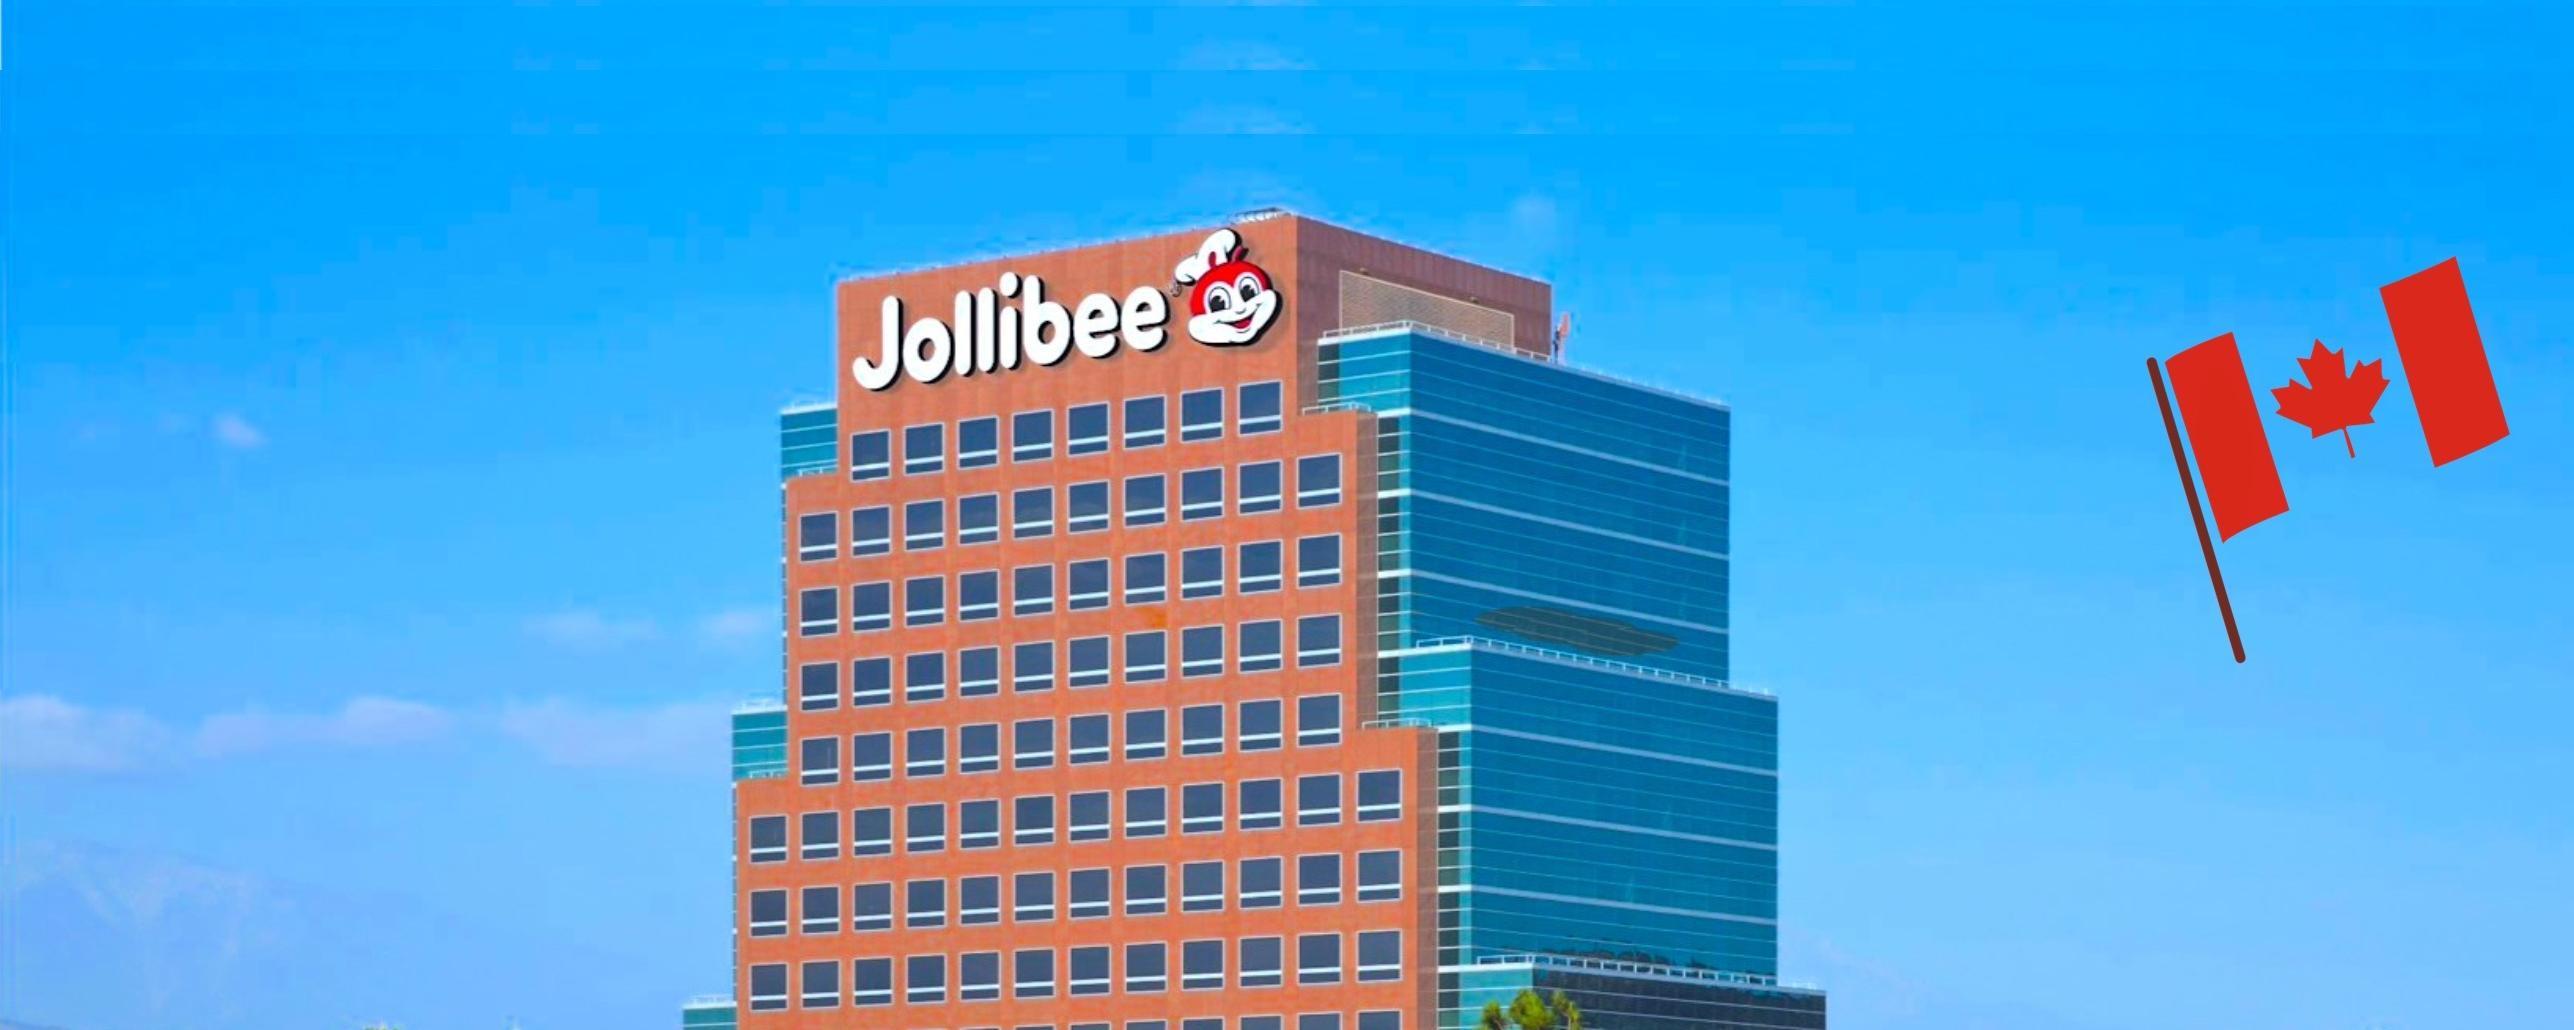 Jollibee Brand Cover